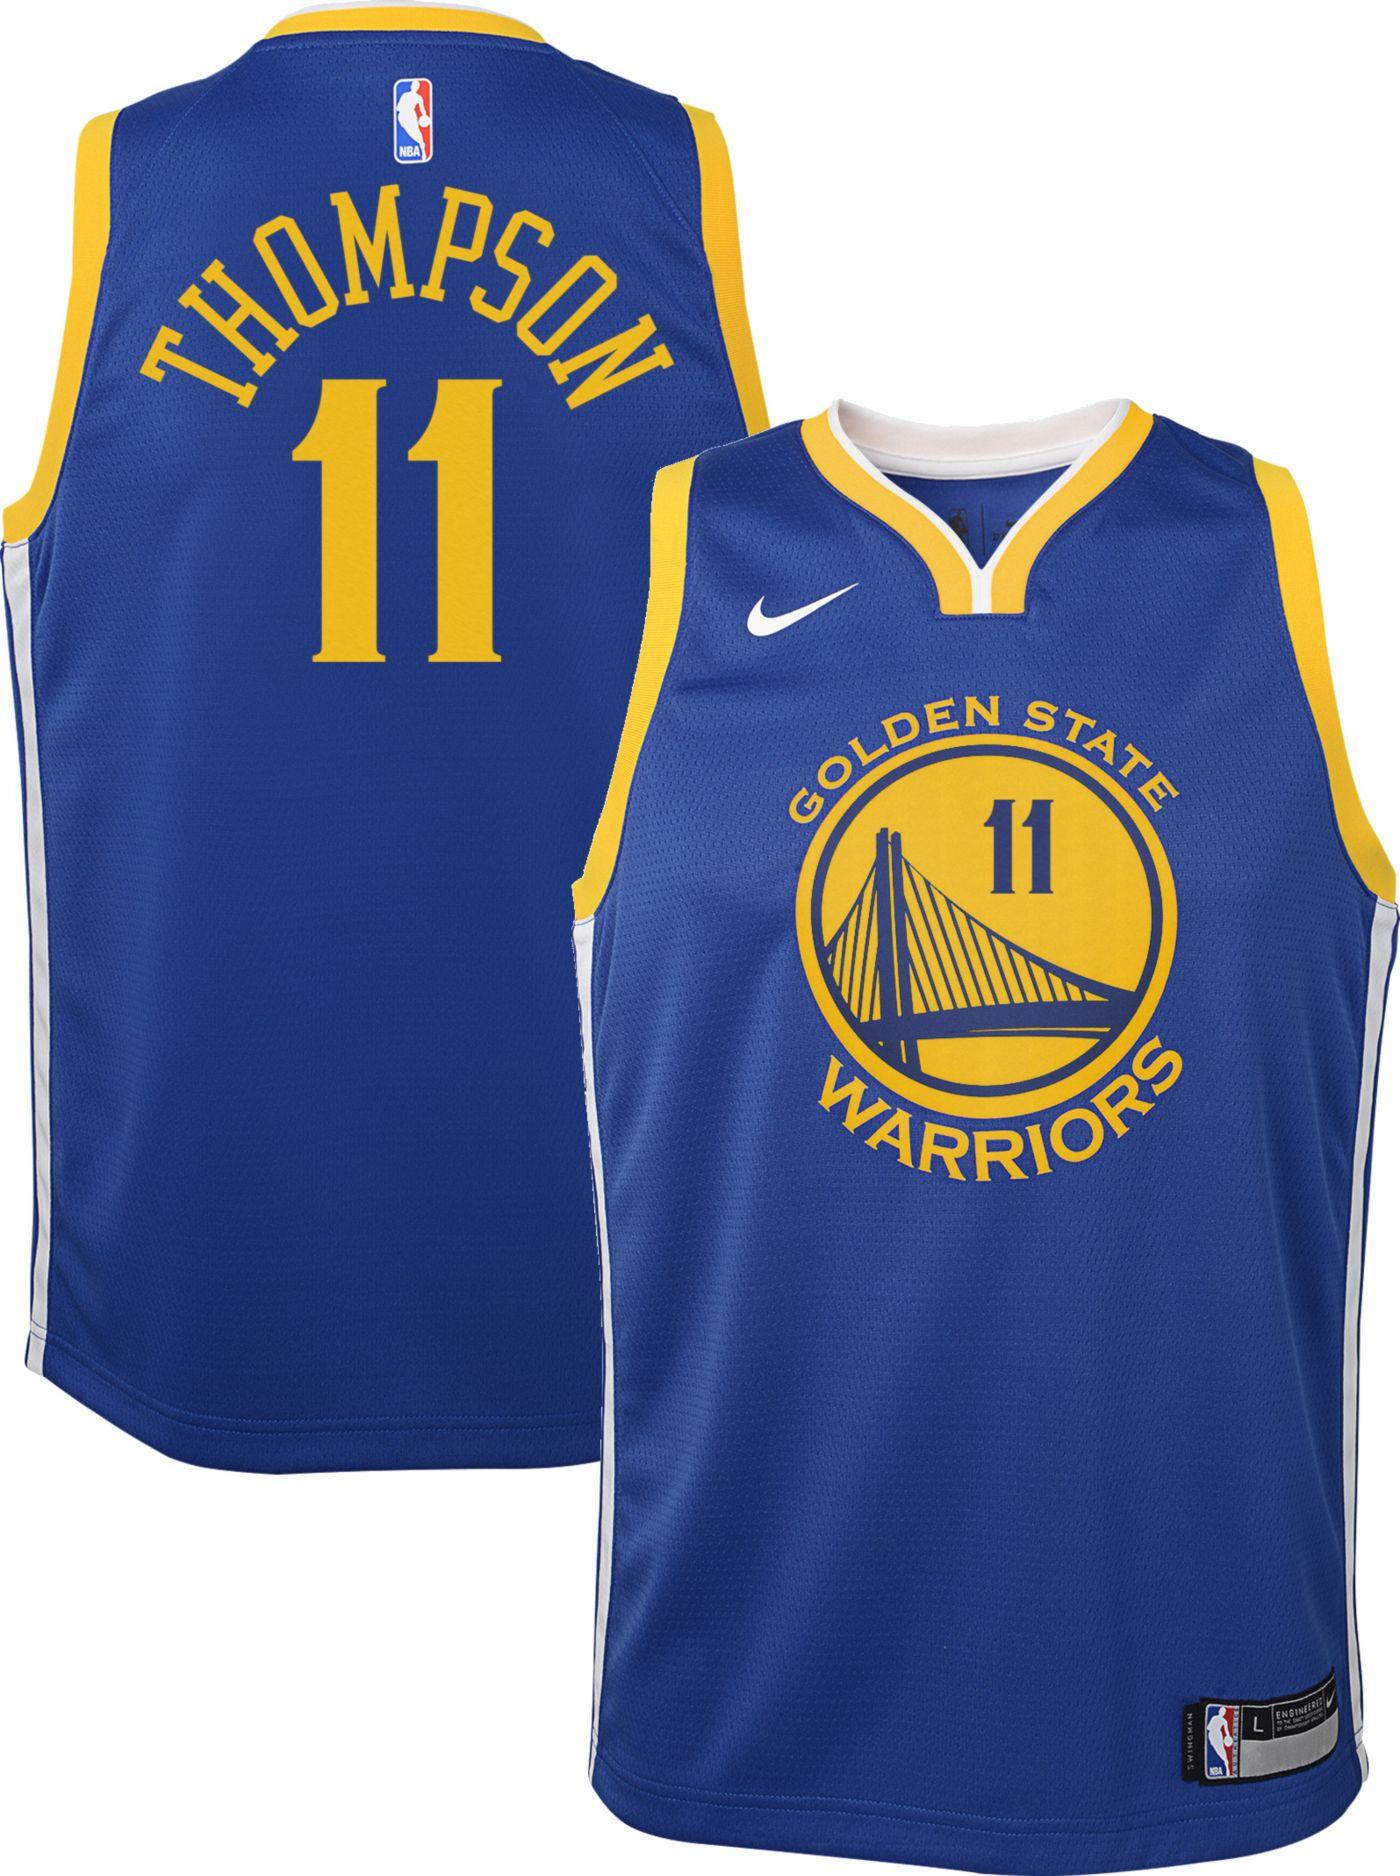 Nike Youth Golden State Warriors Klay Thompson #11 Royal Dri-FIT Swingman Jersey